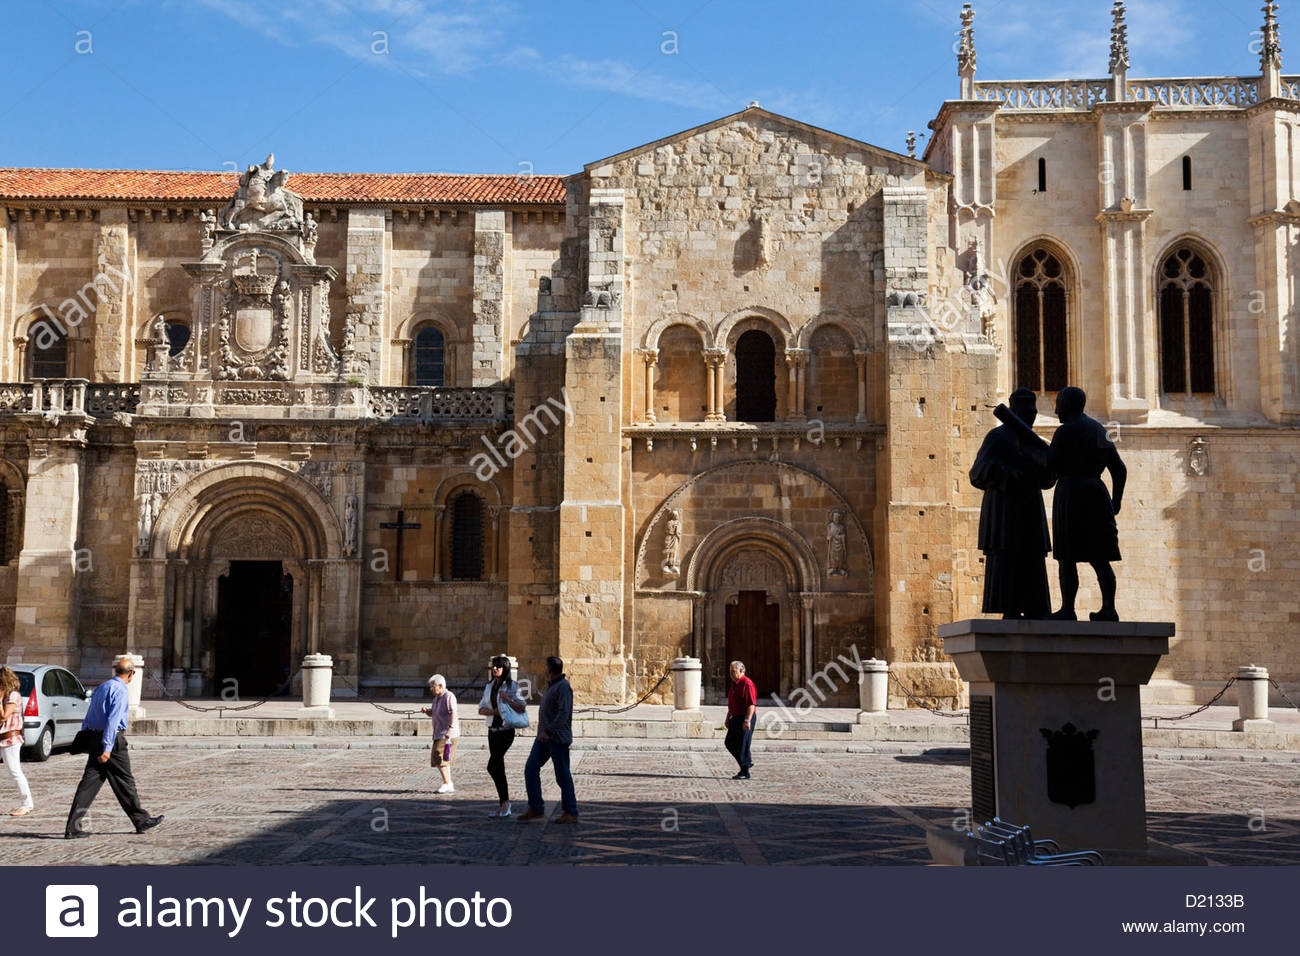 Basilica of San Isidoro in León, Leon, Castile-Leon, Spain - Stock Image